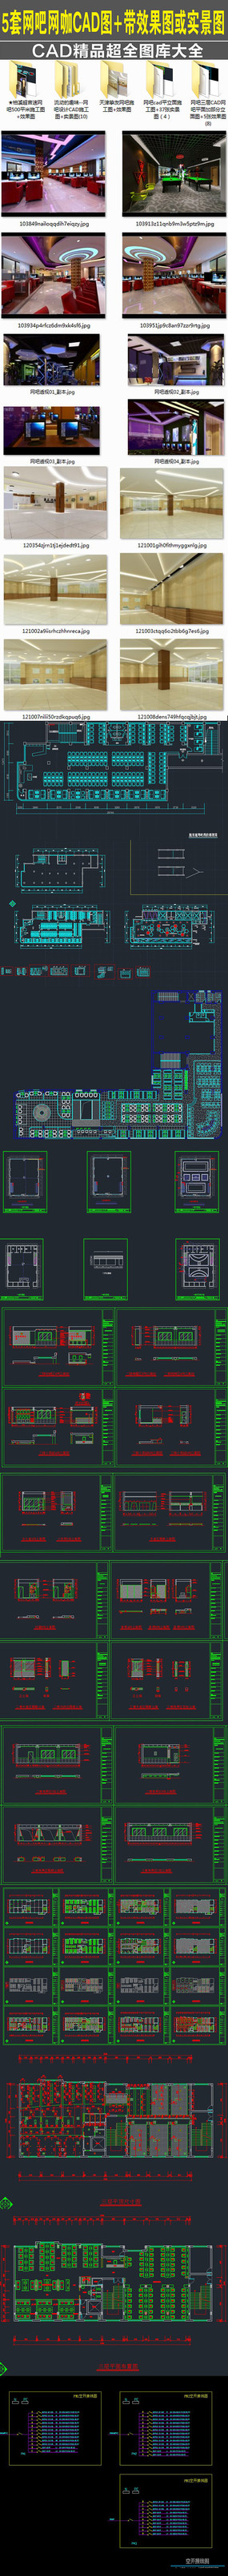 5套网吧CAD图和带效果图 dwg